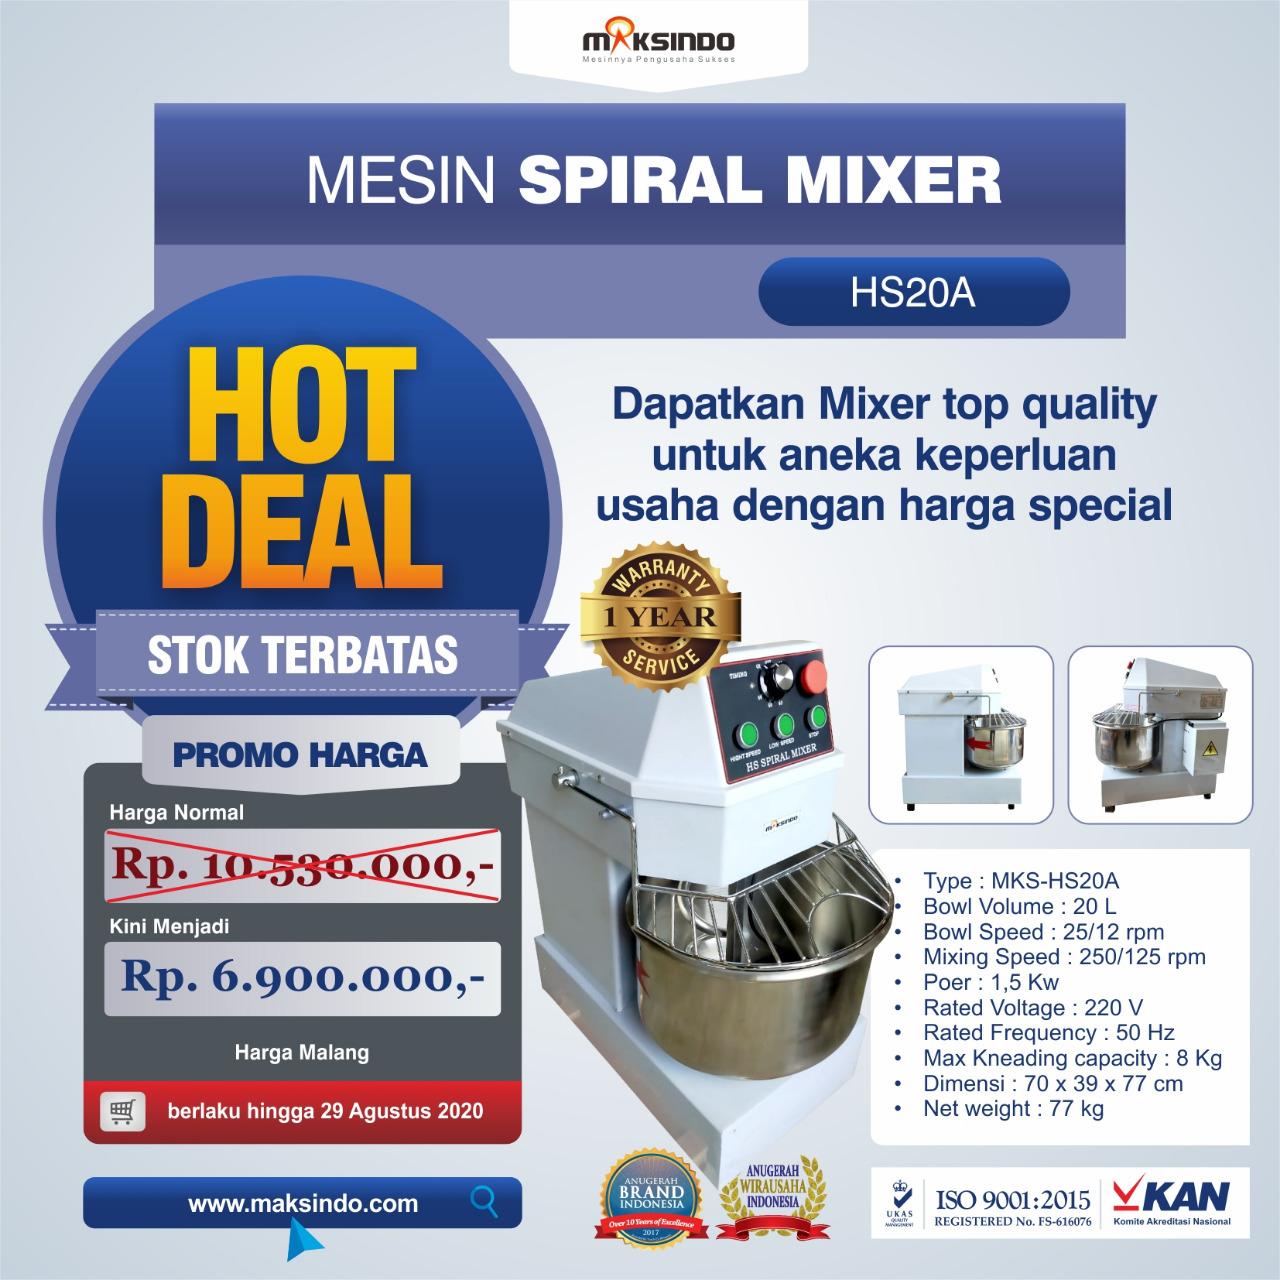 Jual Mesin Mixer Roti SPIRAL MKS-HS20A di Banjarmasin